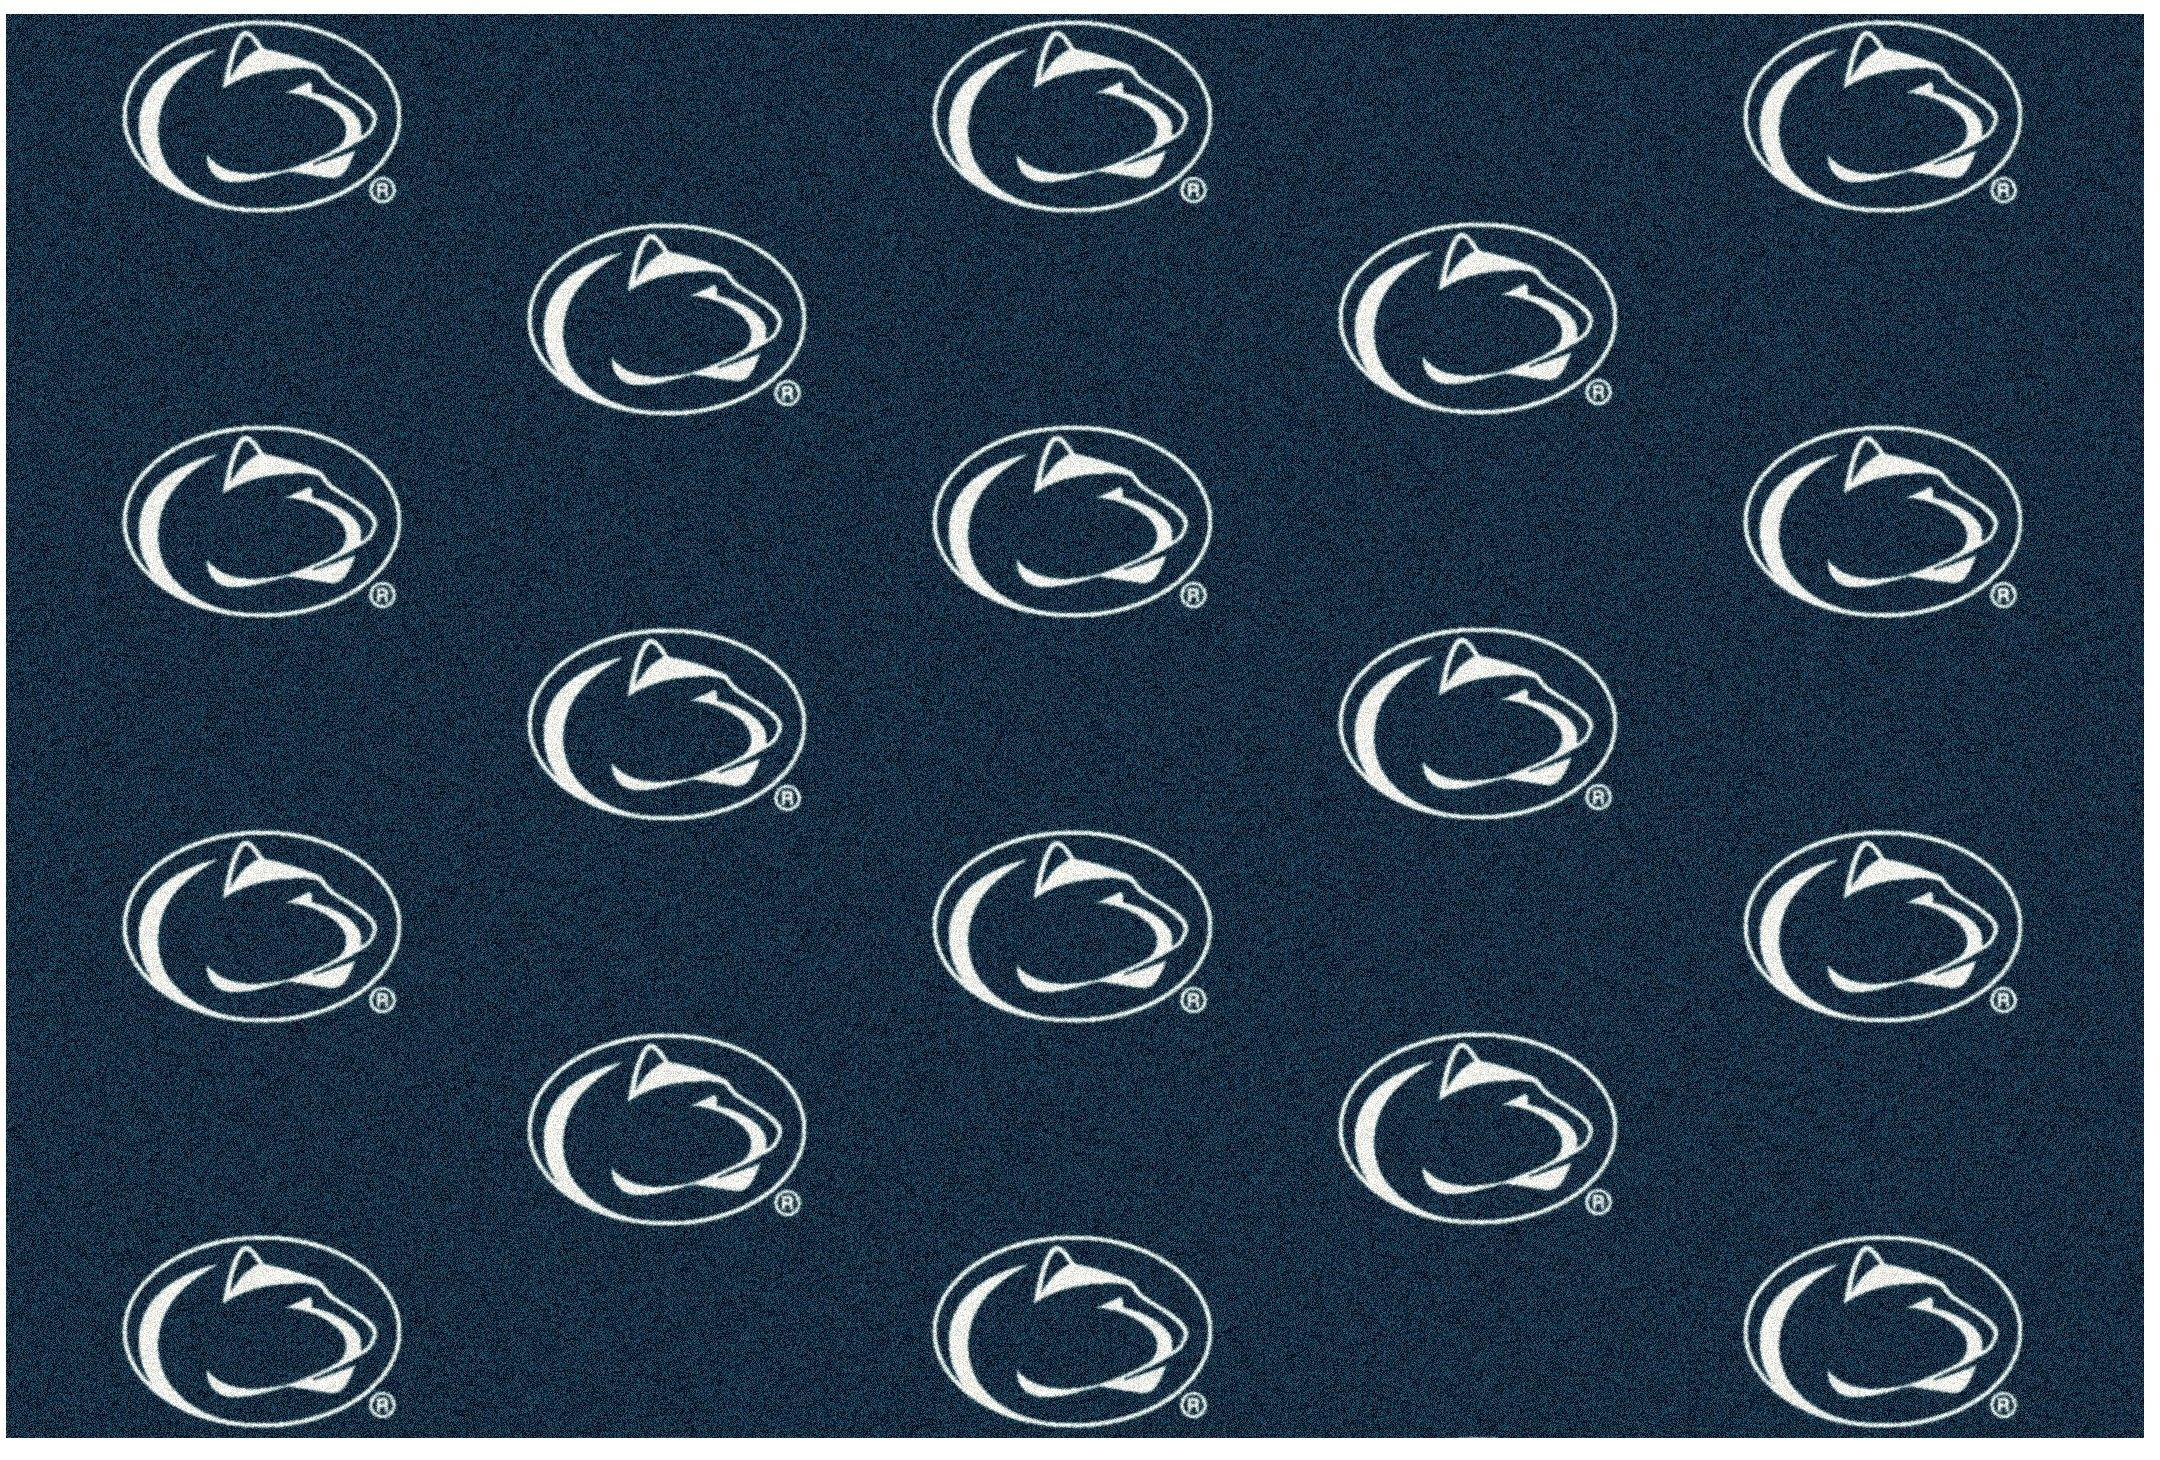 8'x10' PENN STATE - Milliken NCAA College Sports Team Repeat Logo 100% Nylon Pile Fiber Broadloom Custom Area Rug Carpet with Premium Bound Edges by Koeckritz